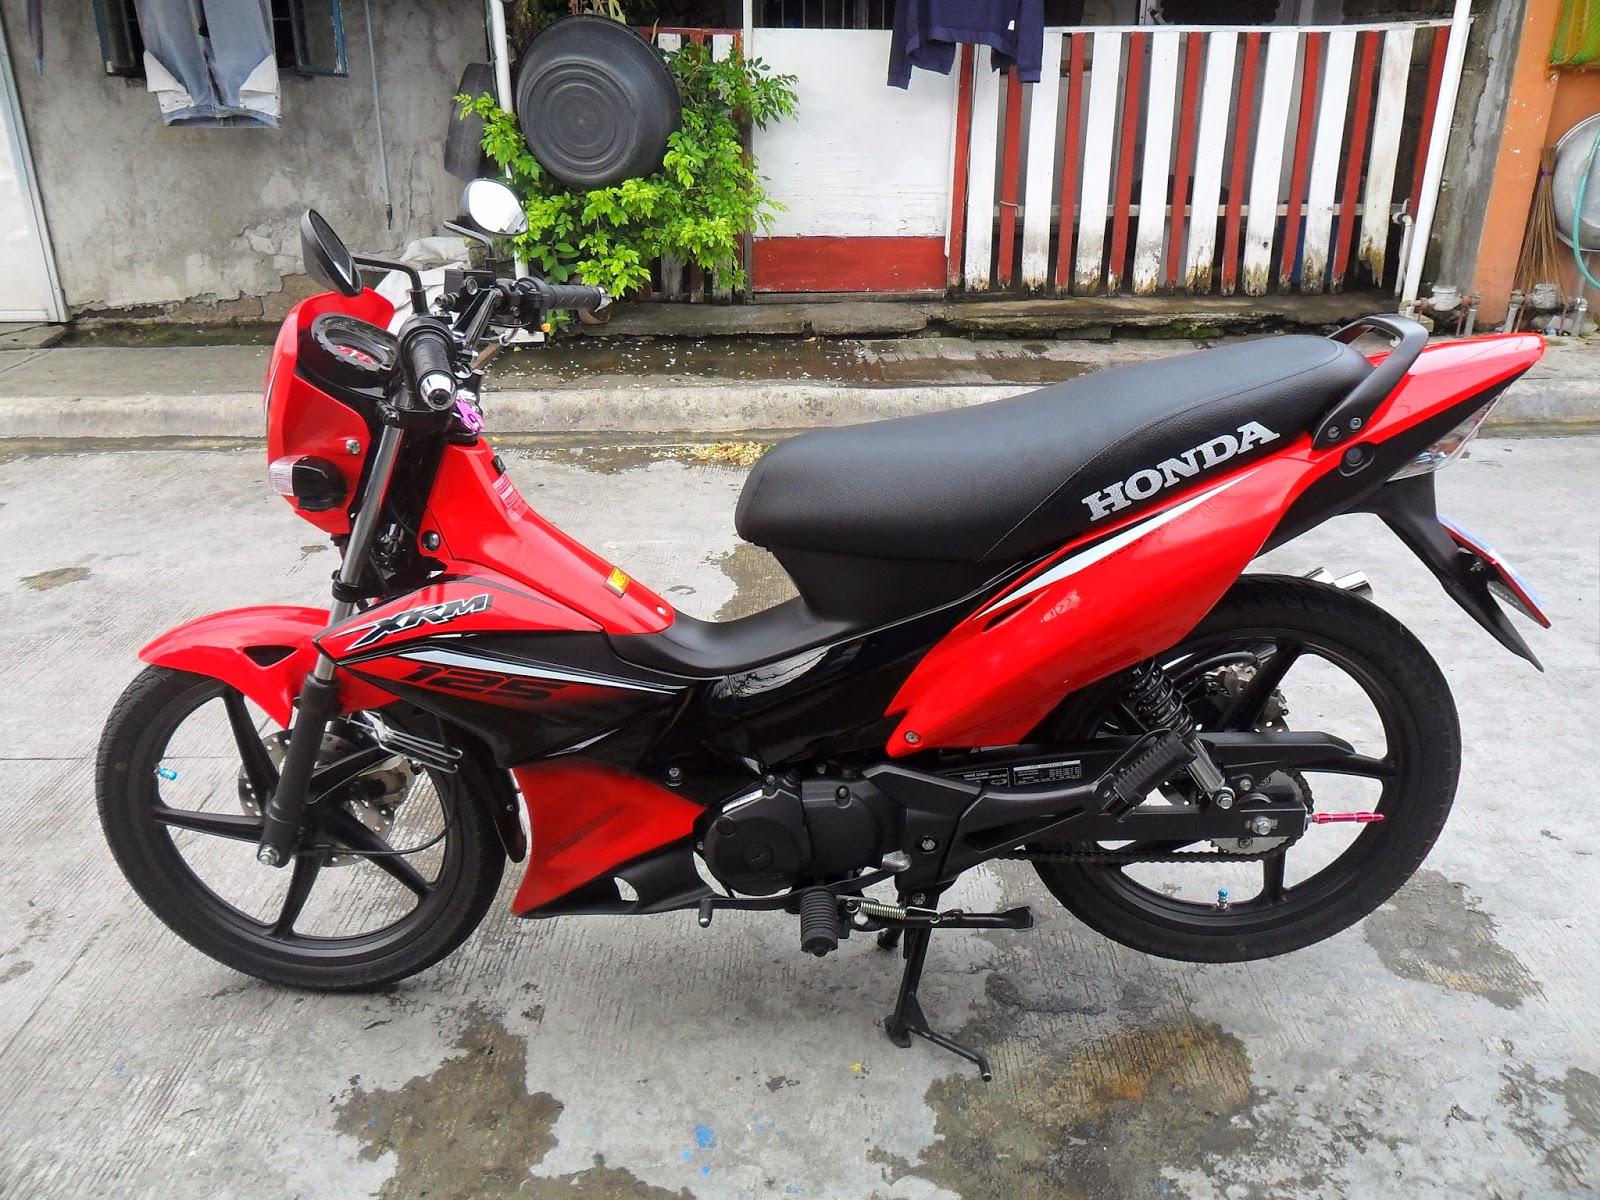 Honda Xrm 125 Motard Wiring Diagram Blank Venn Word Document Motorcycle Addict